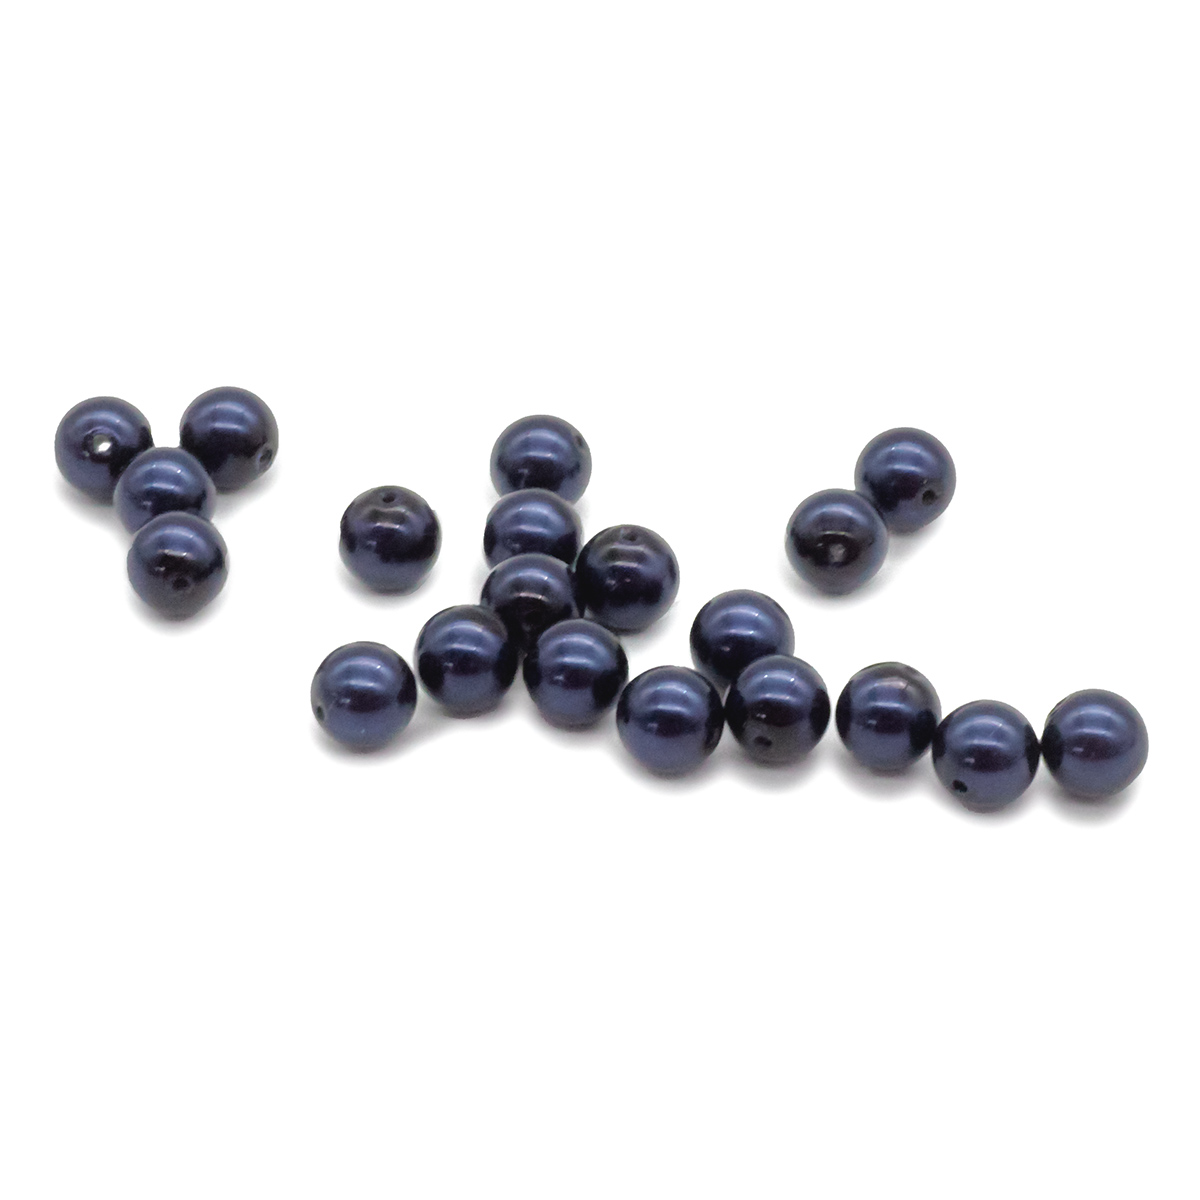 131-10-011 Хрустальный жемчуг Dark Blue 6мм. 20 шт. Preciosa